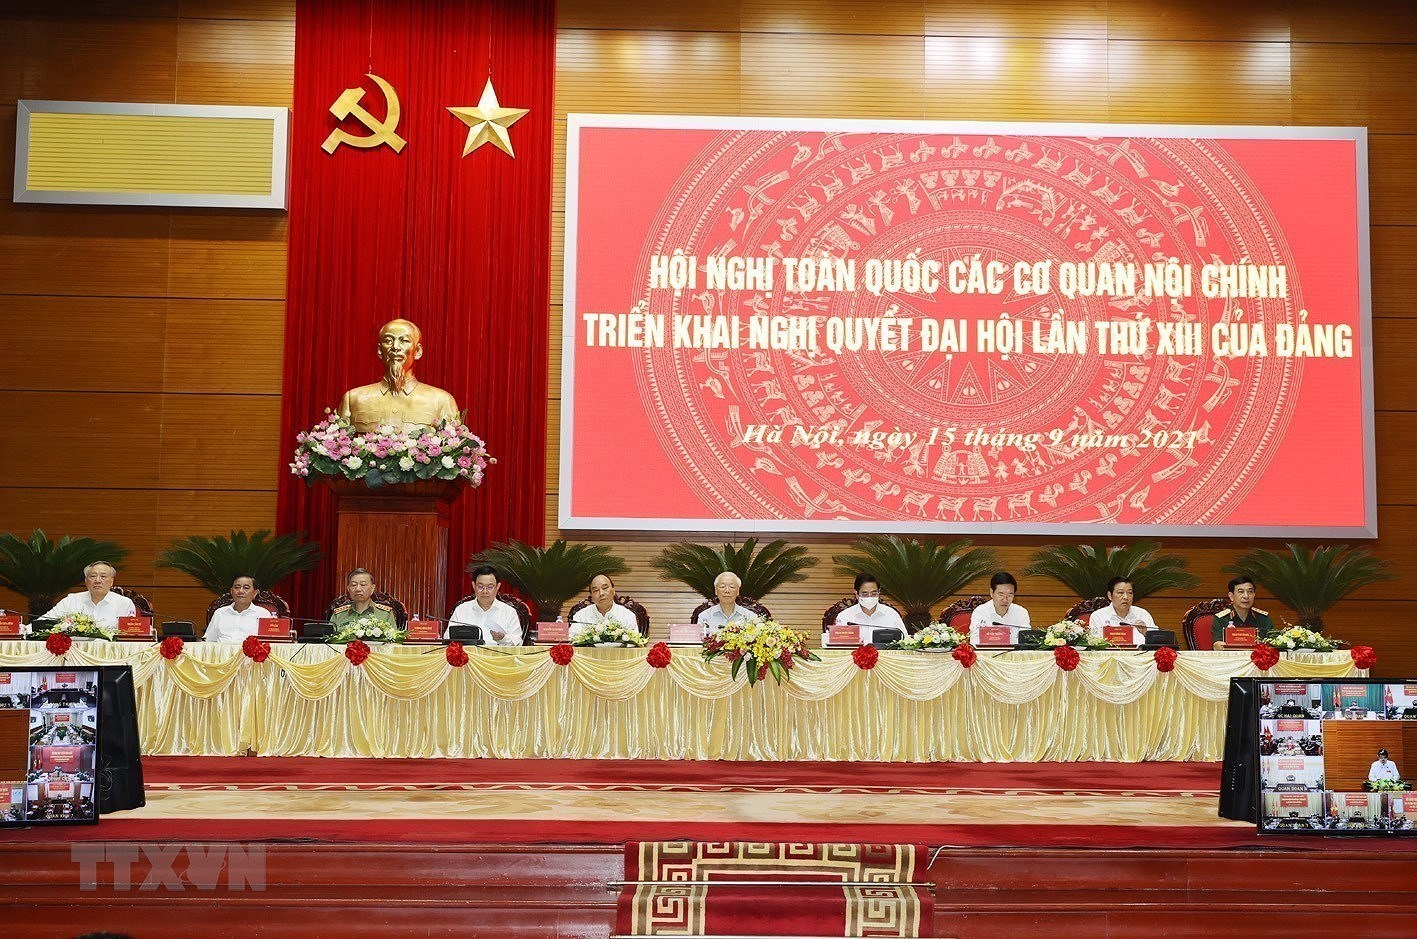 "Cac co quan noi chinh phai that su la nhung ""Thanh bao kiem sac ben"" hinh anh 4"